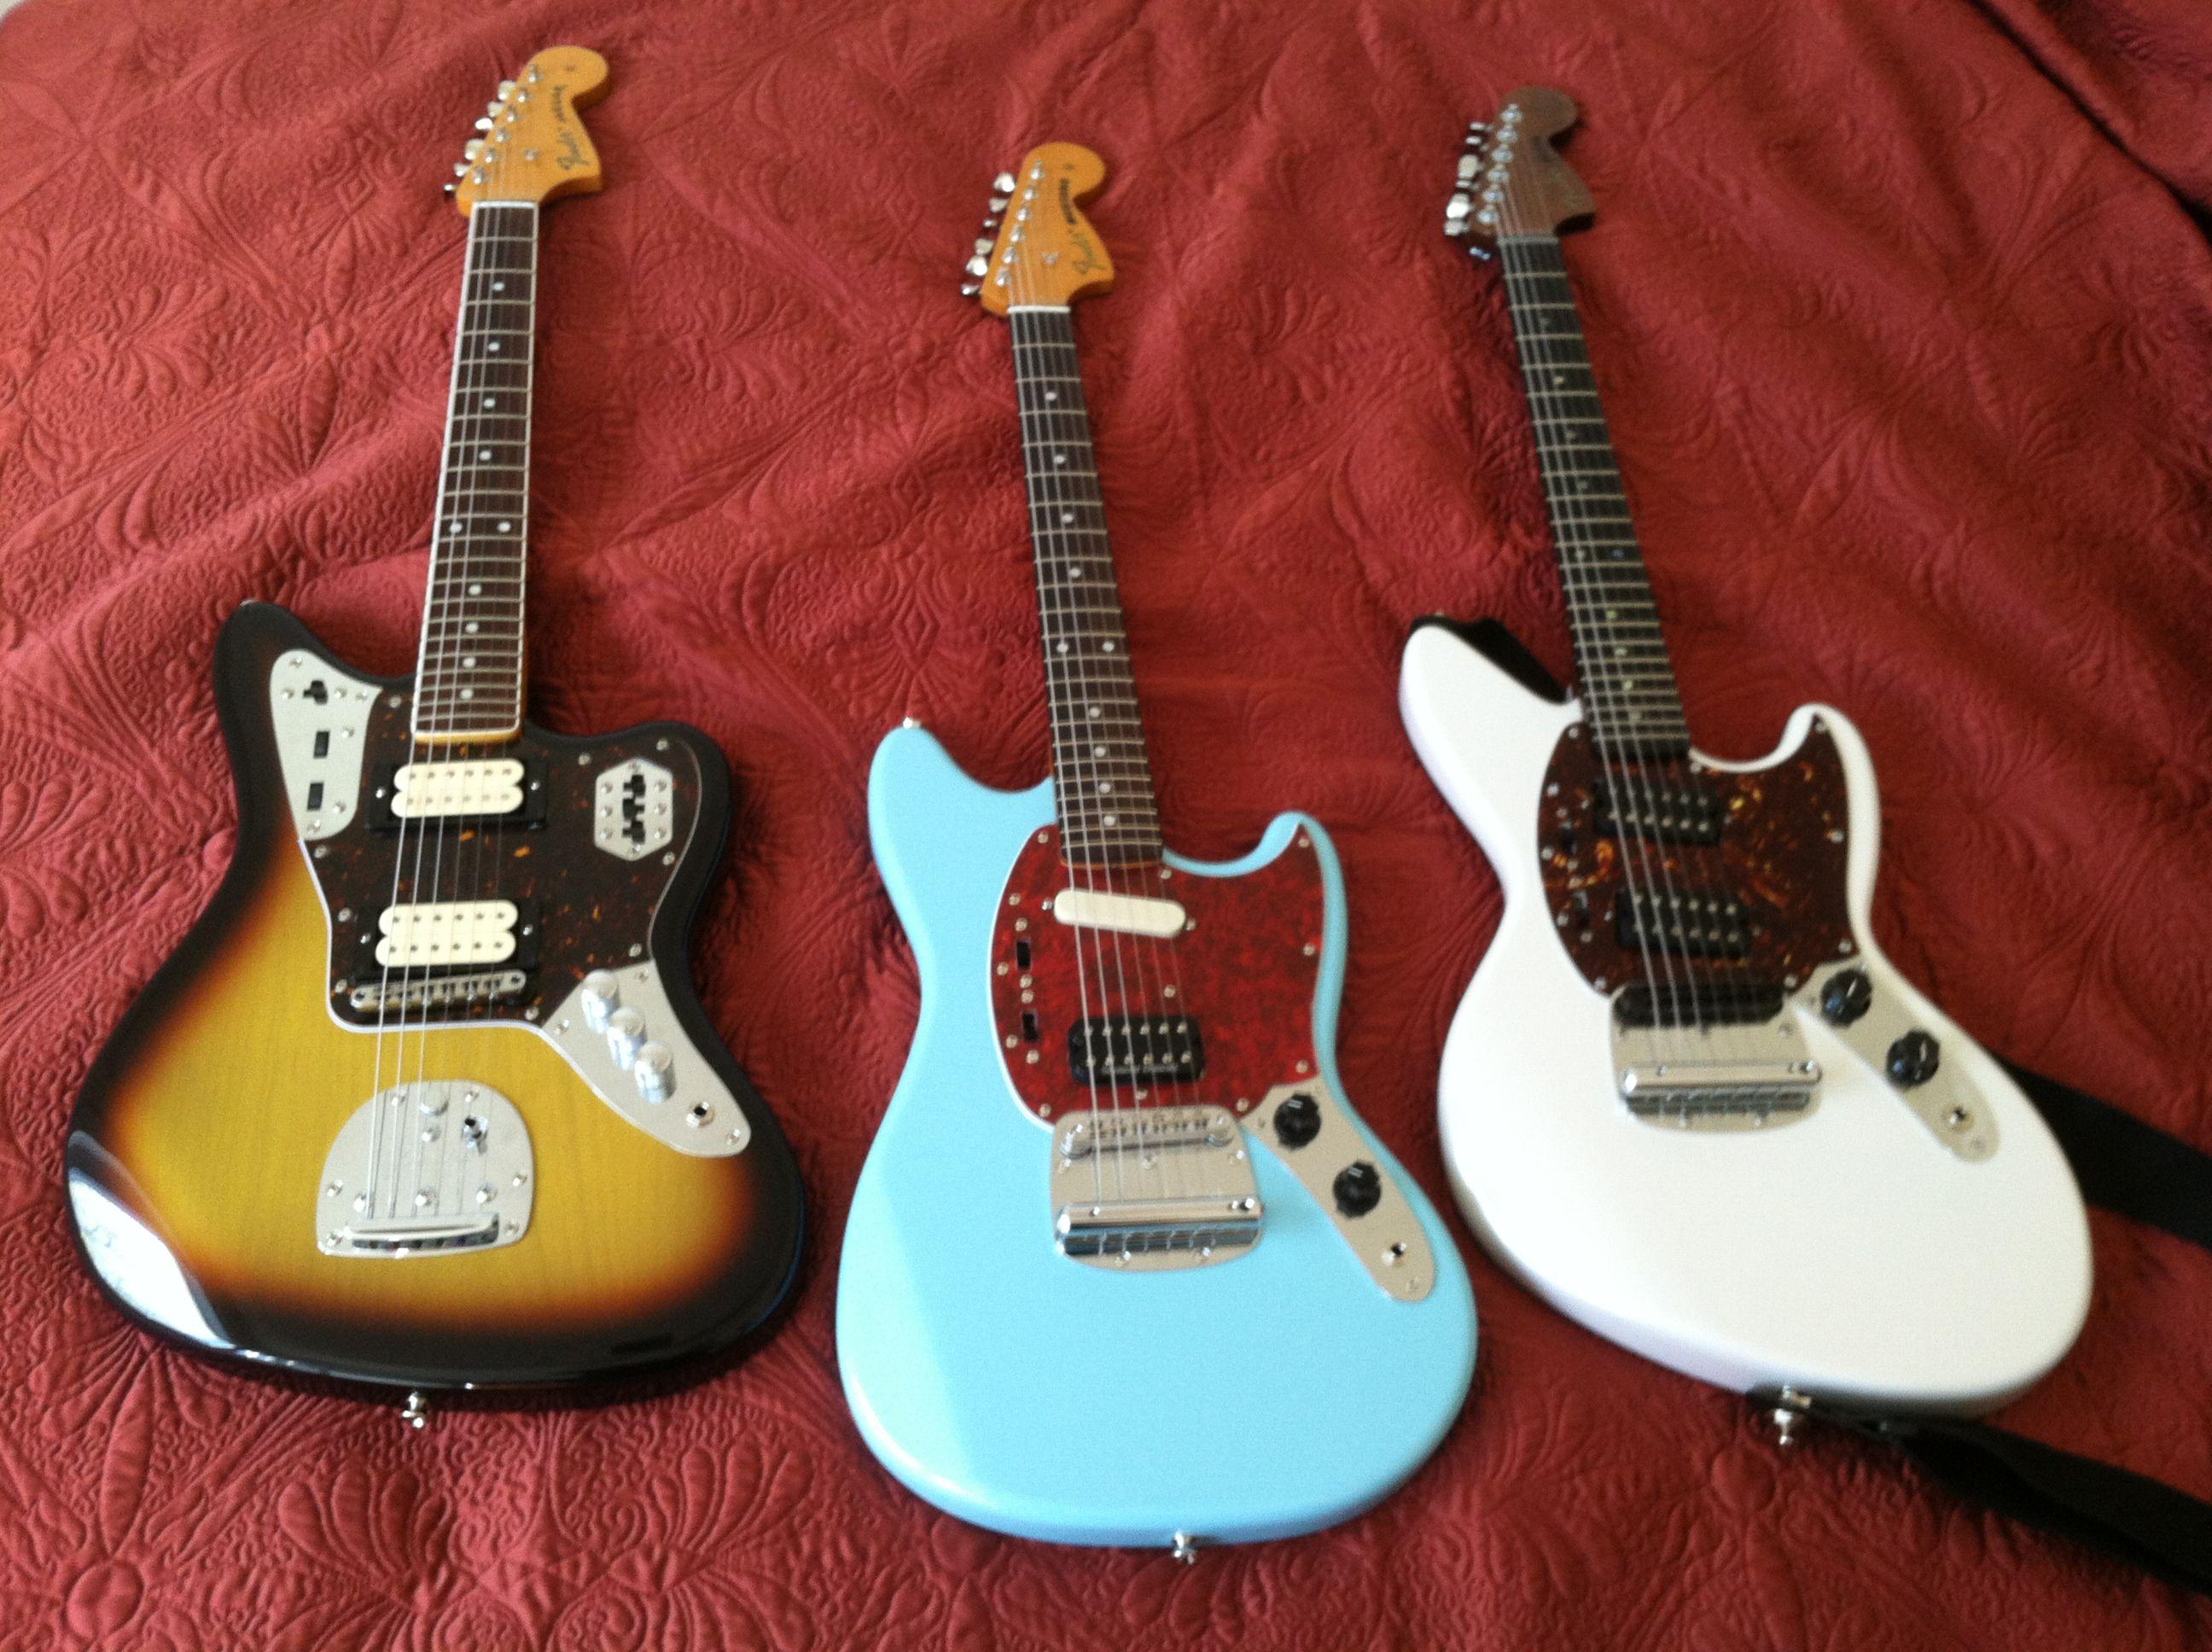 fender japan jaguar mustang jagstang all kurt cobain guitars nice kurt cobain guitars. Black Bedroom Furniture Sets. Home Design Ideas